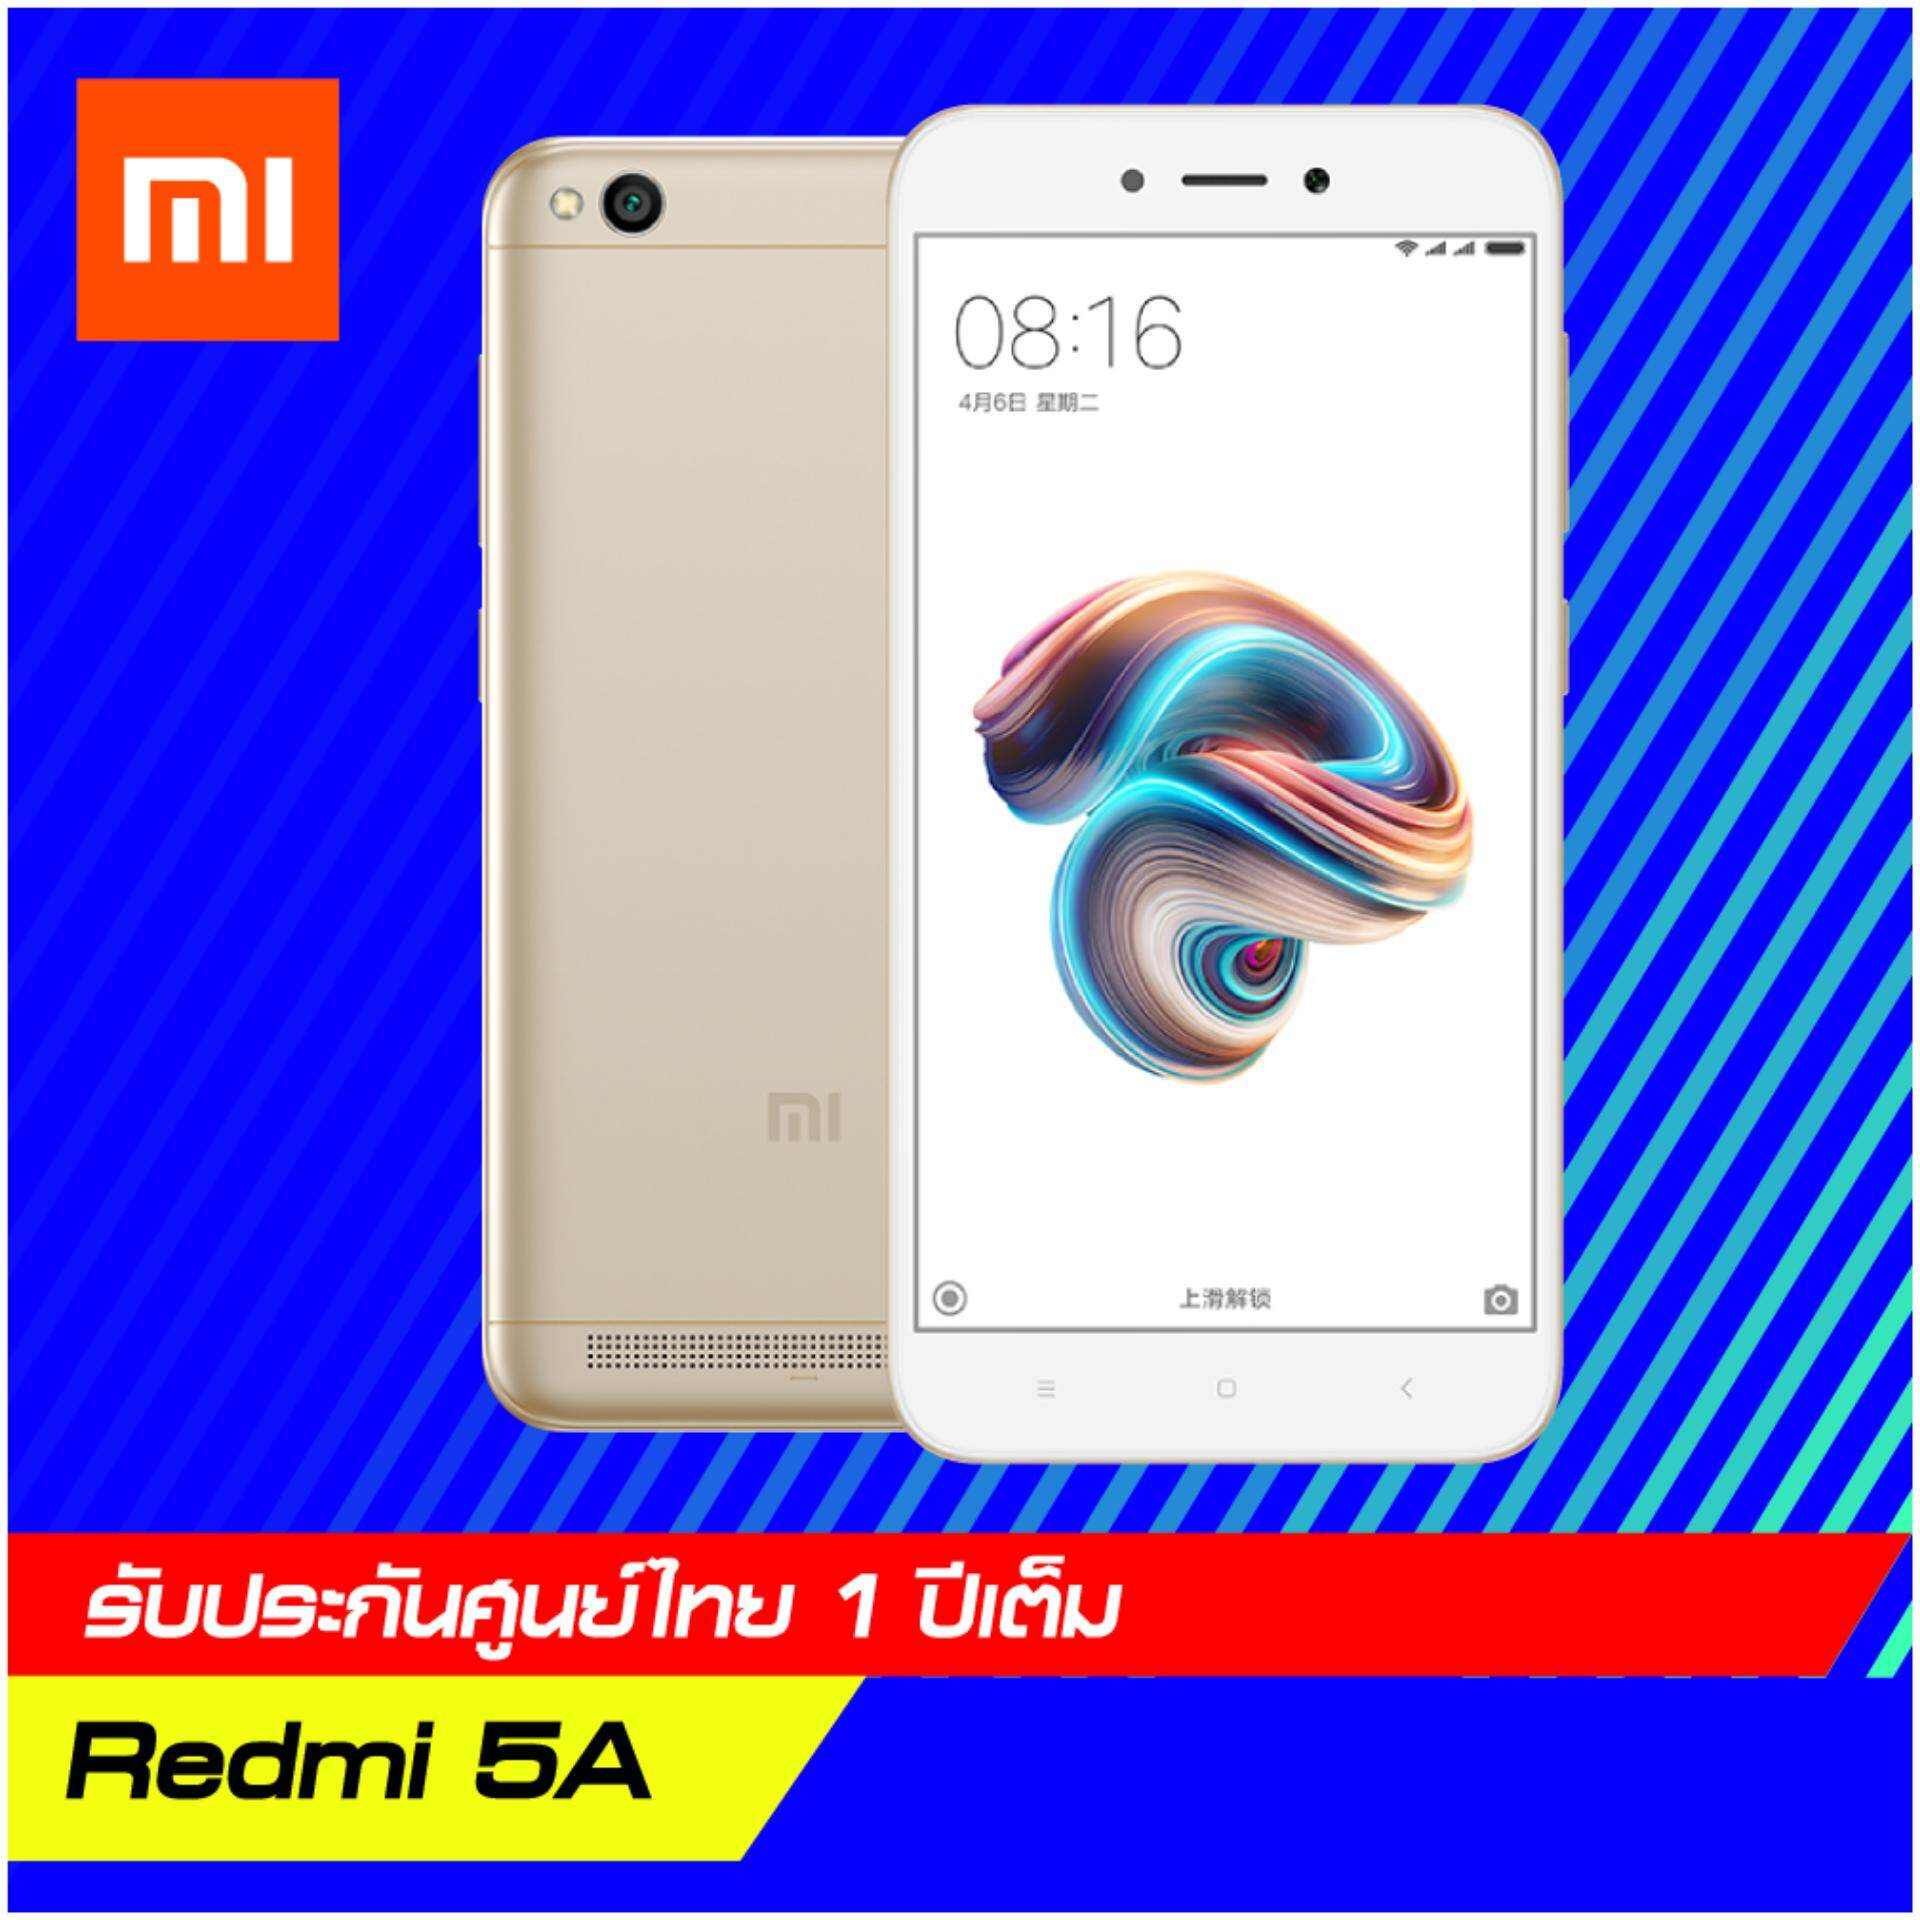 Xiaomi Redmi 5A (2/16GB) รับประกันศูนย์ไทย 1 ปีเต็ม!!